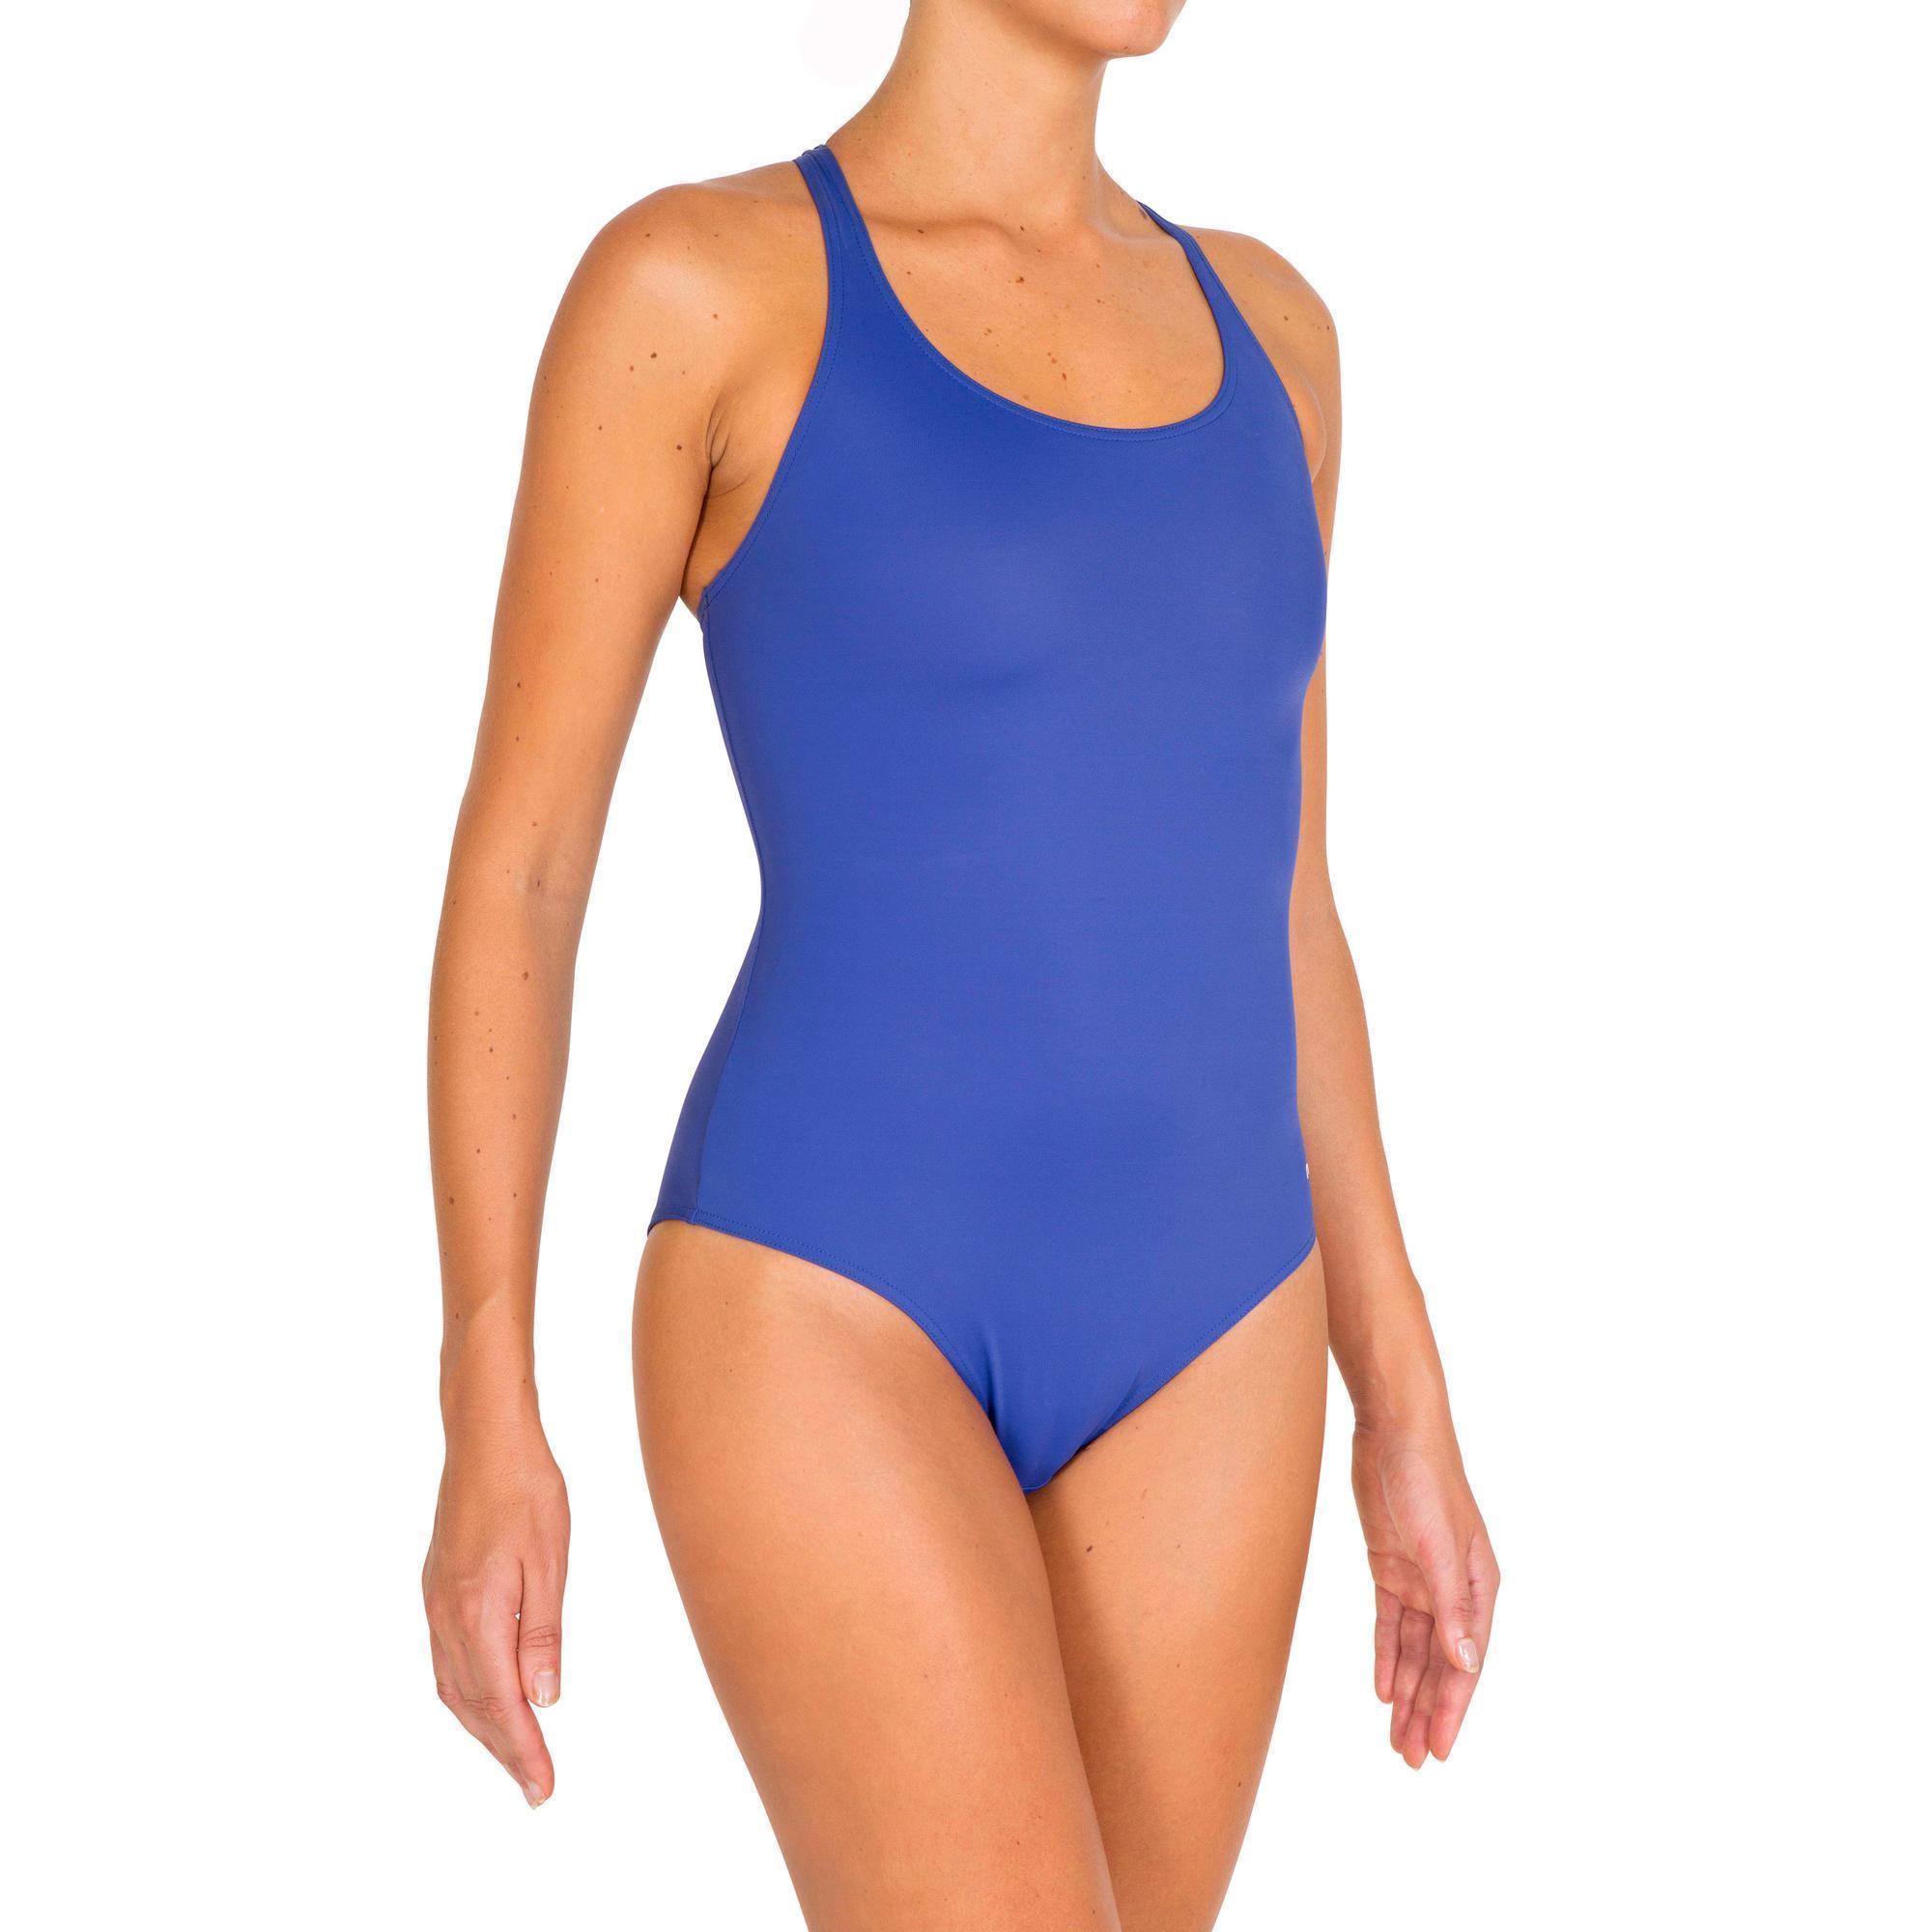 b513fdef14551 bl-magi swimsuit.txt at master · BlueLens bl-magi · GitHub